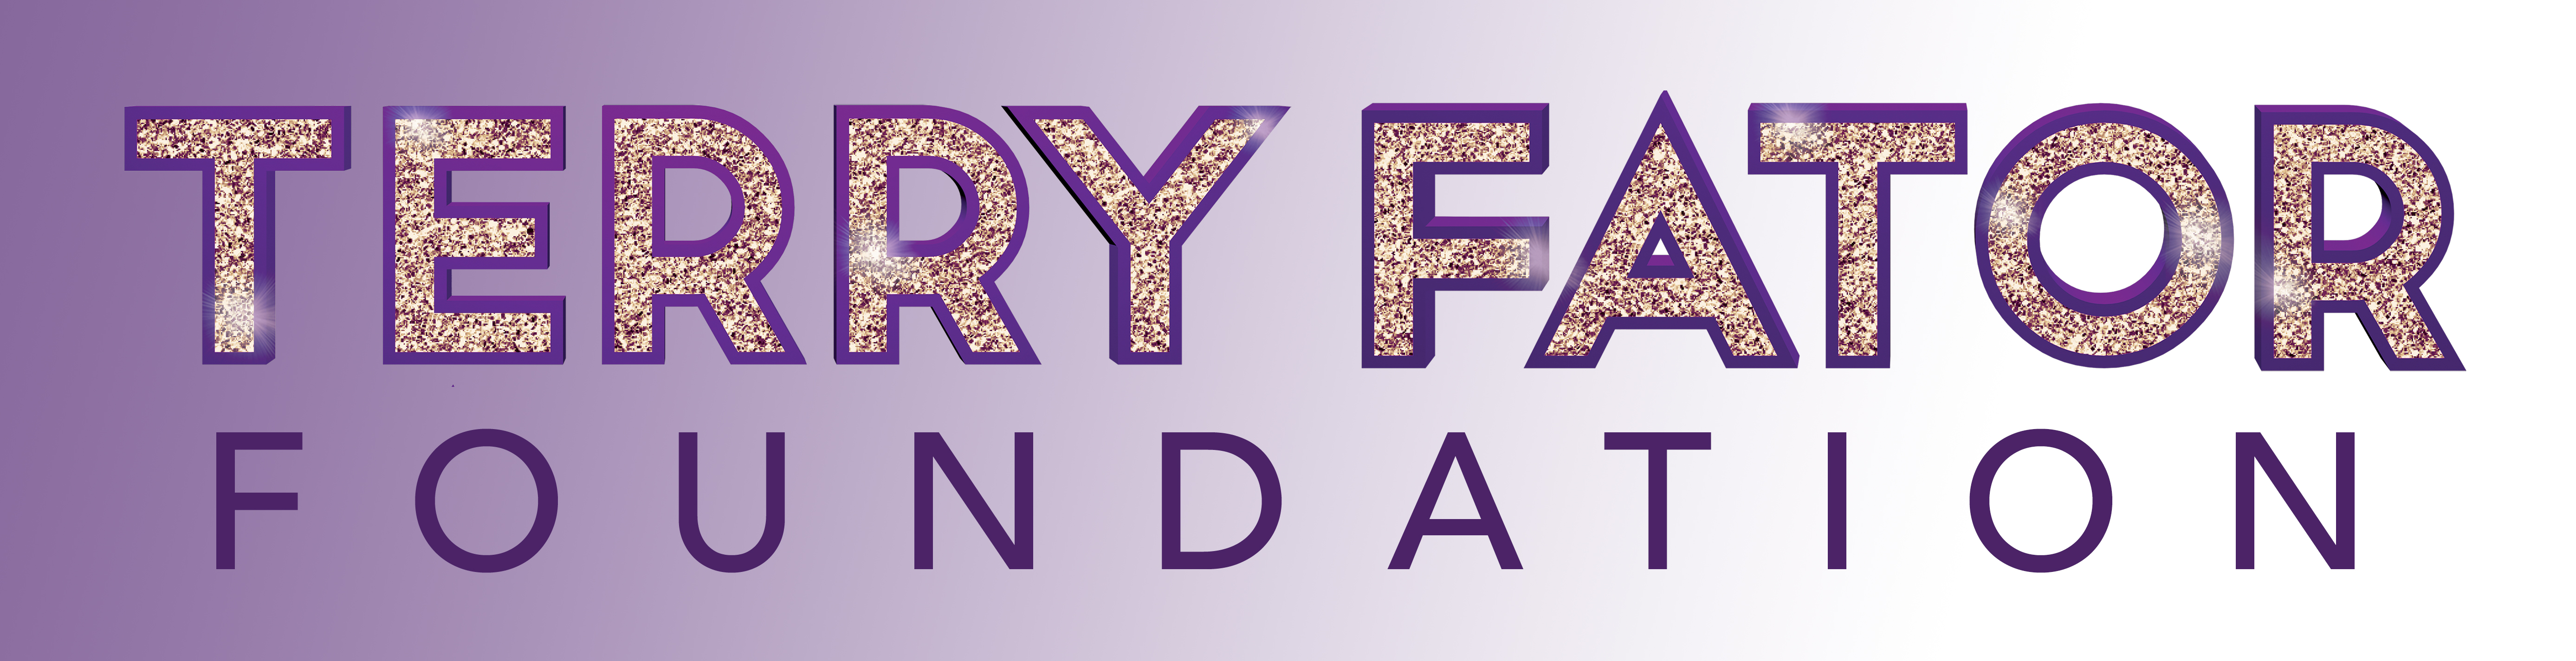 Terry Fator | Las Vegas Shows | Official Site